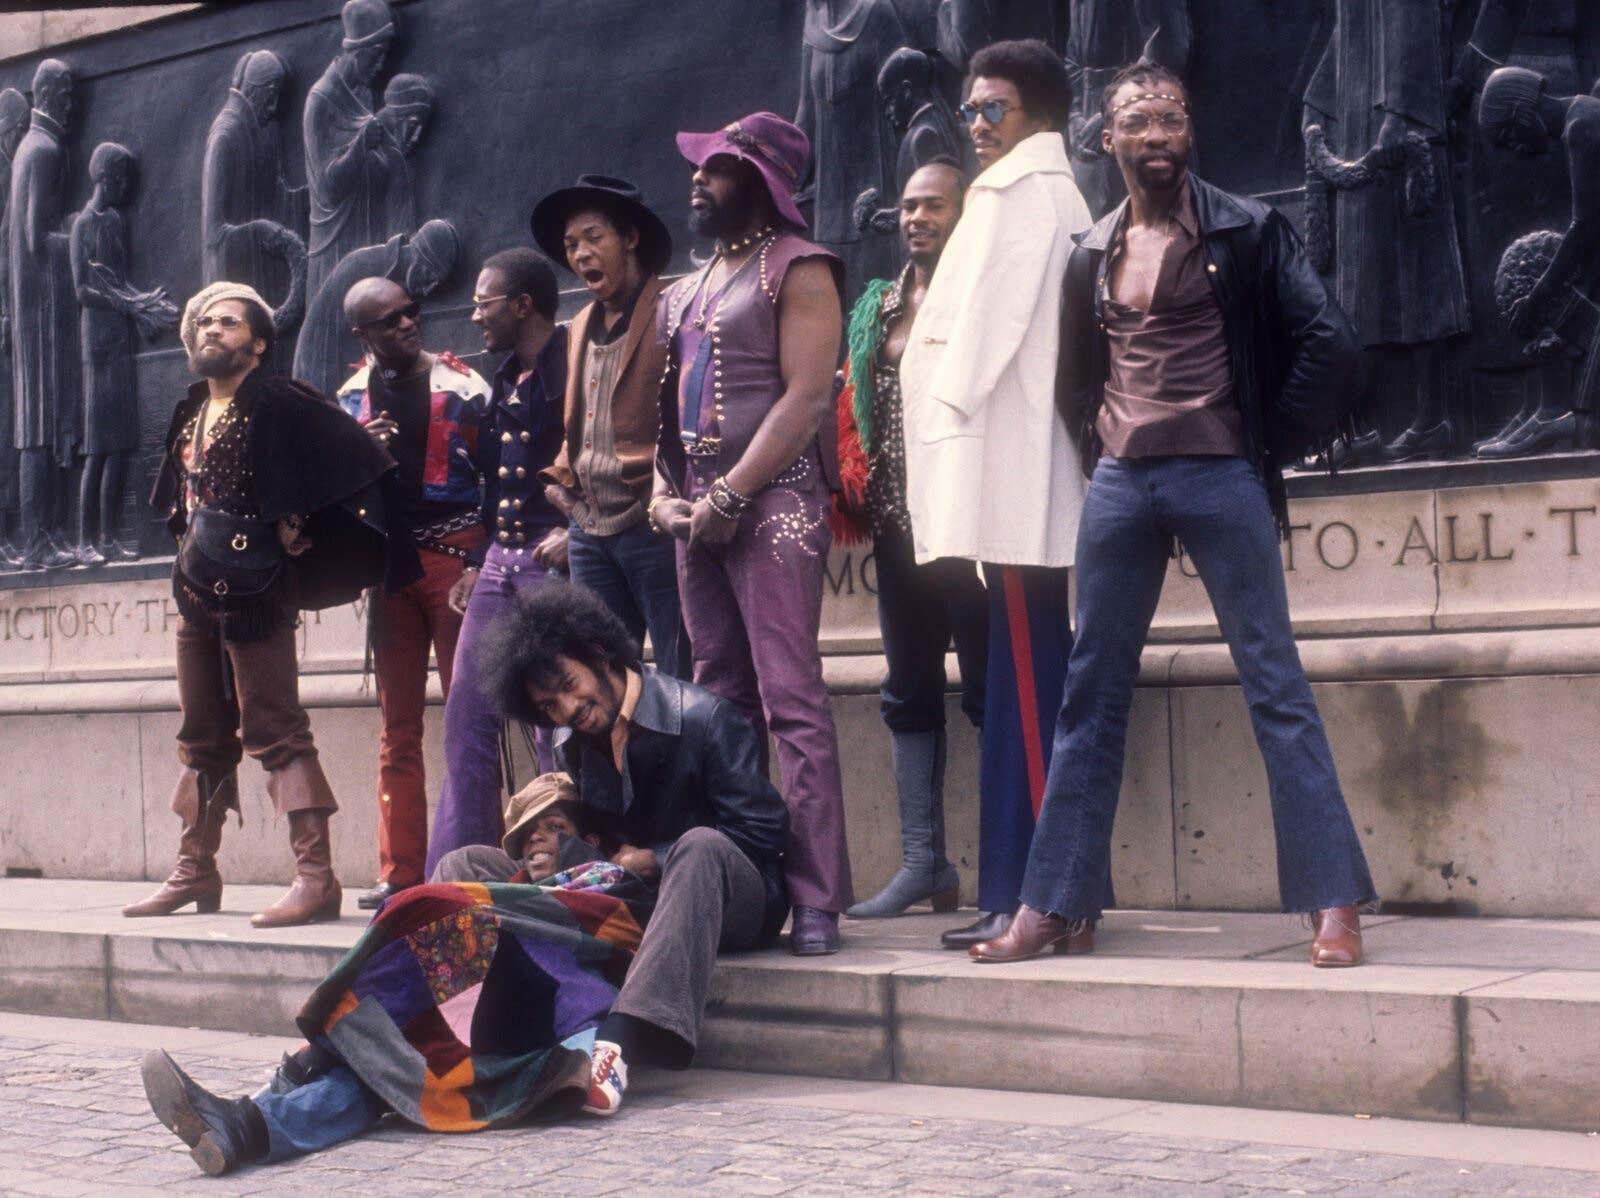 Parliament-Funkadelic Portrait In England